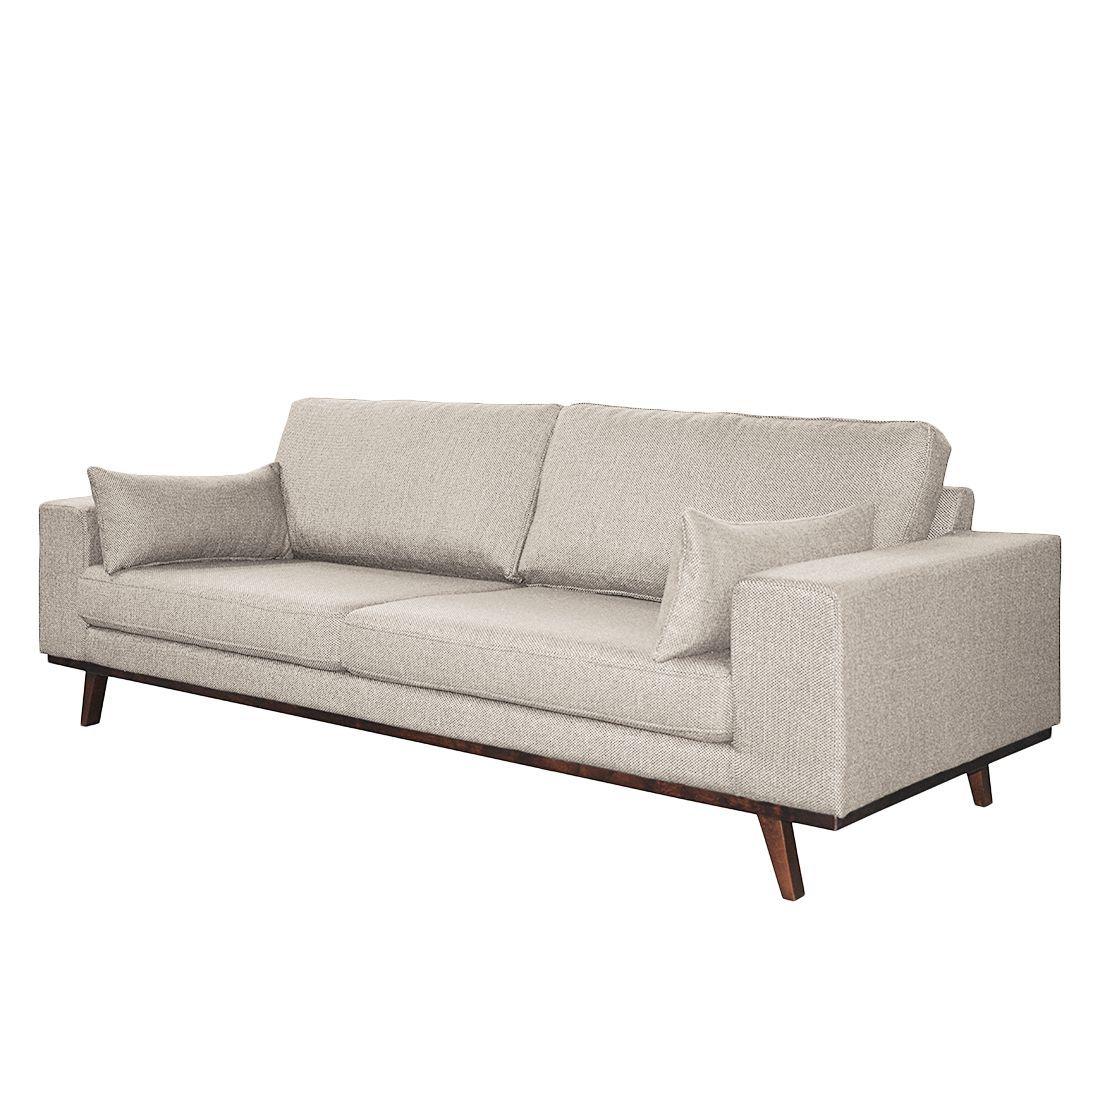 Sofa Billund 3 Sitzer Strukturstoff Sofa Design Sofa Sofa Mit Relaxfunktion